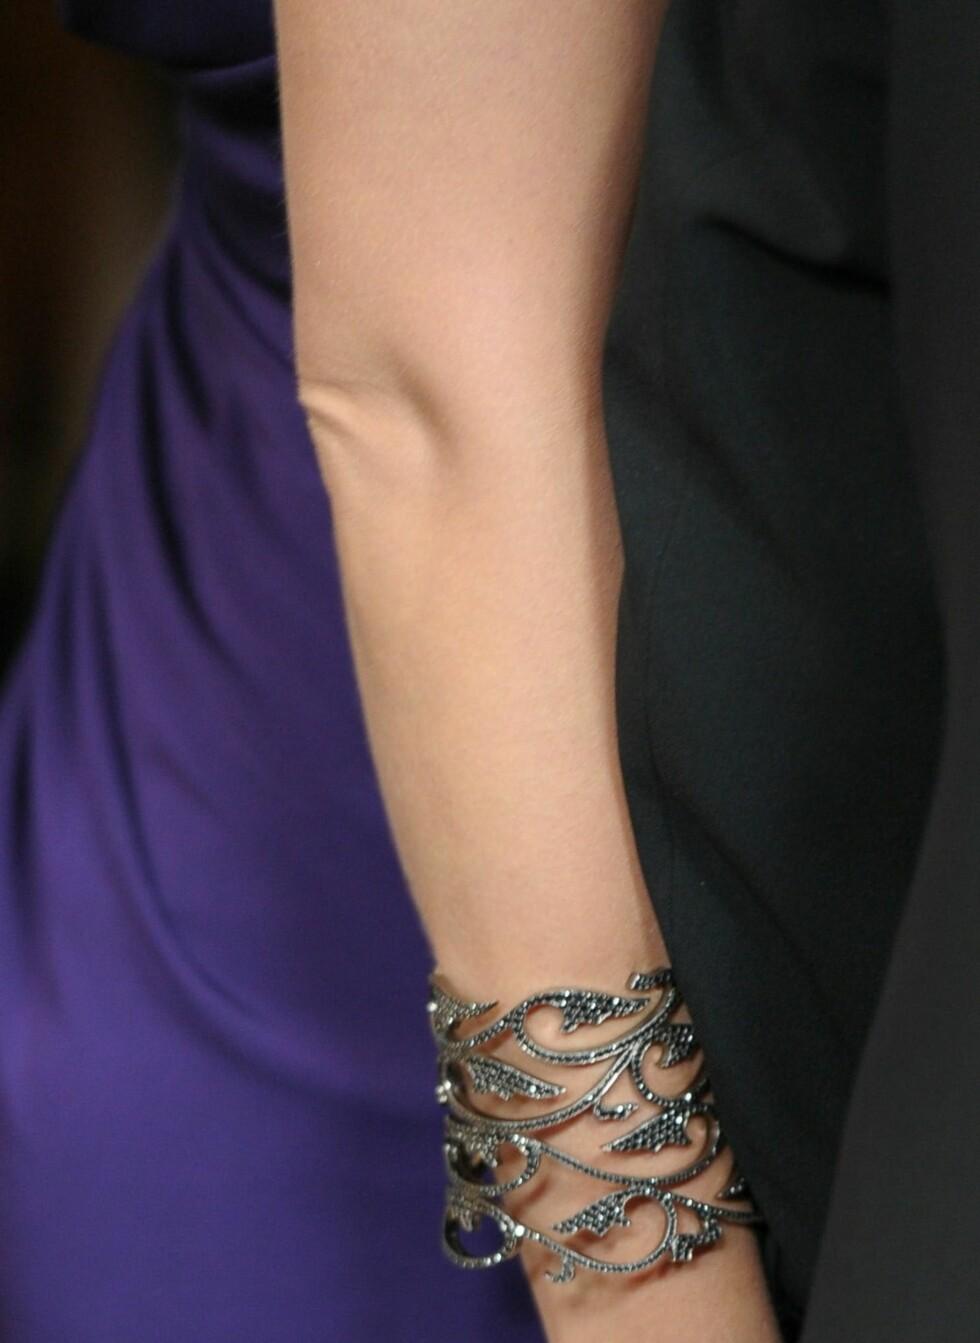 Skuespiller Joanna Garcia med glitrende sølvarmbånd til lilla silkekjole. Foto: All Over Press